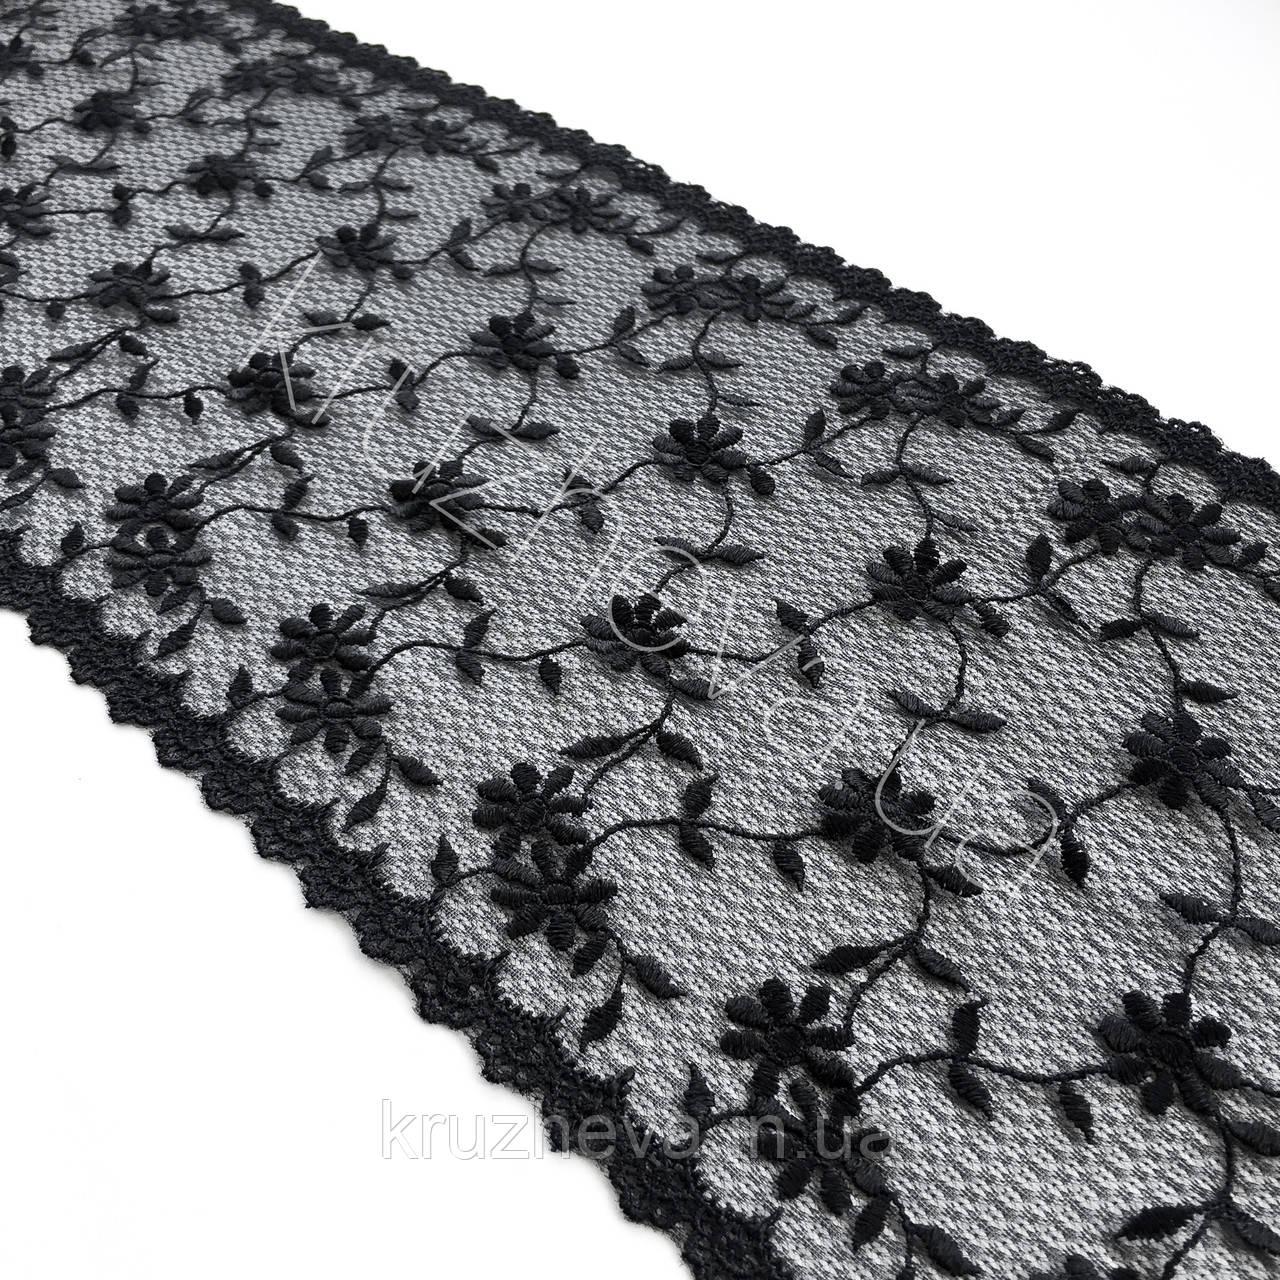 Ажурное кружево вышивка на сетке черного цвета, ширина 19 см